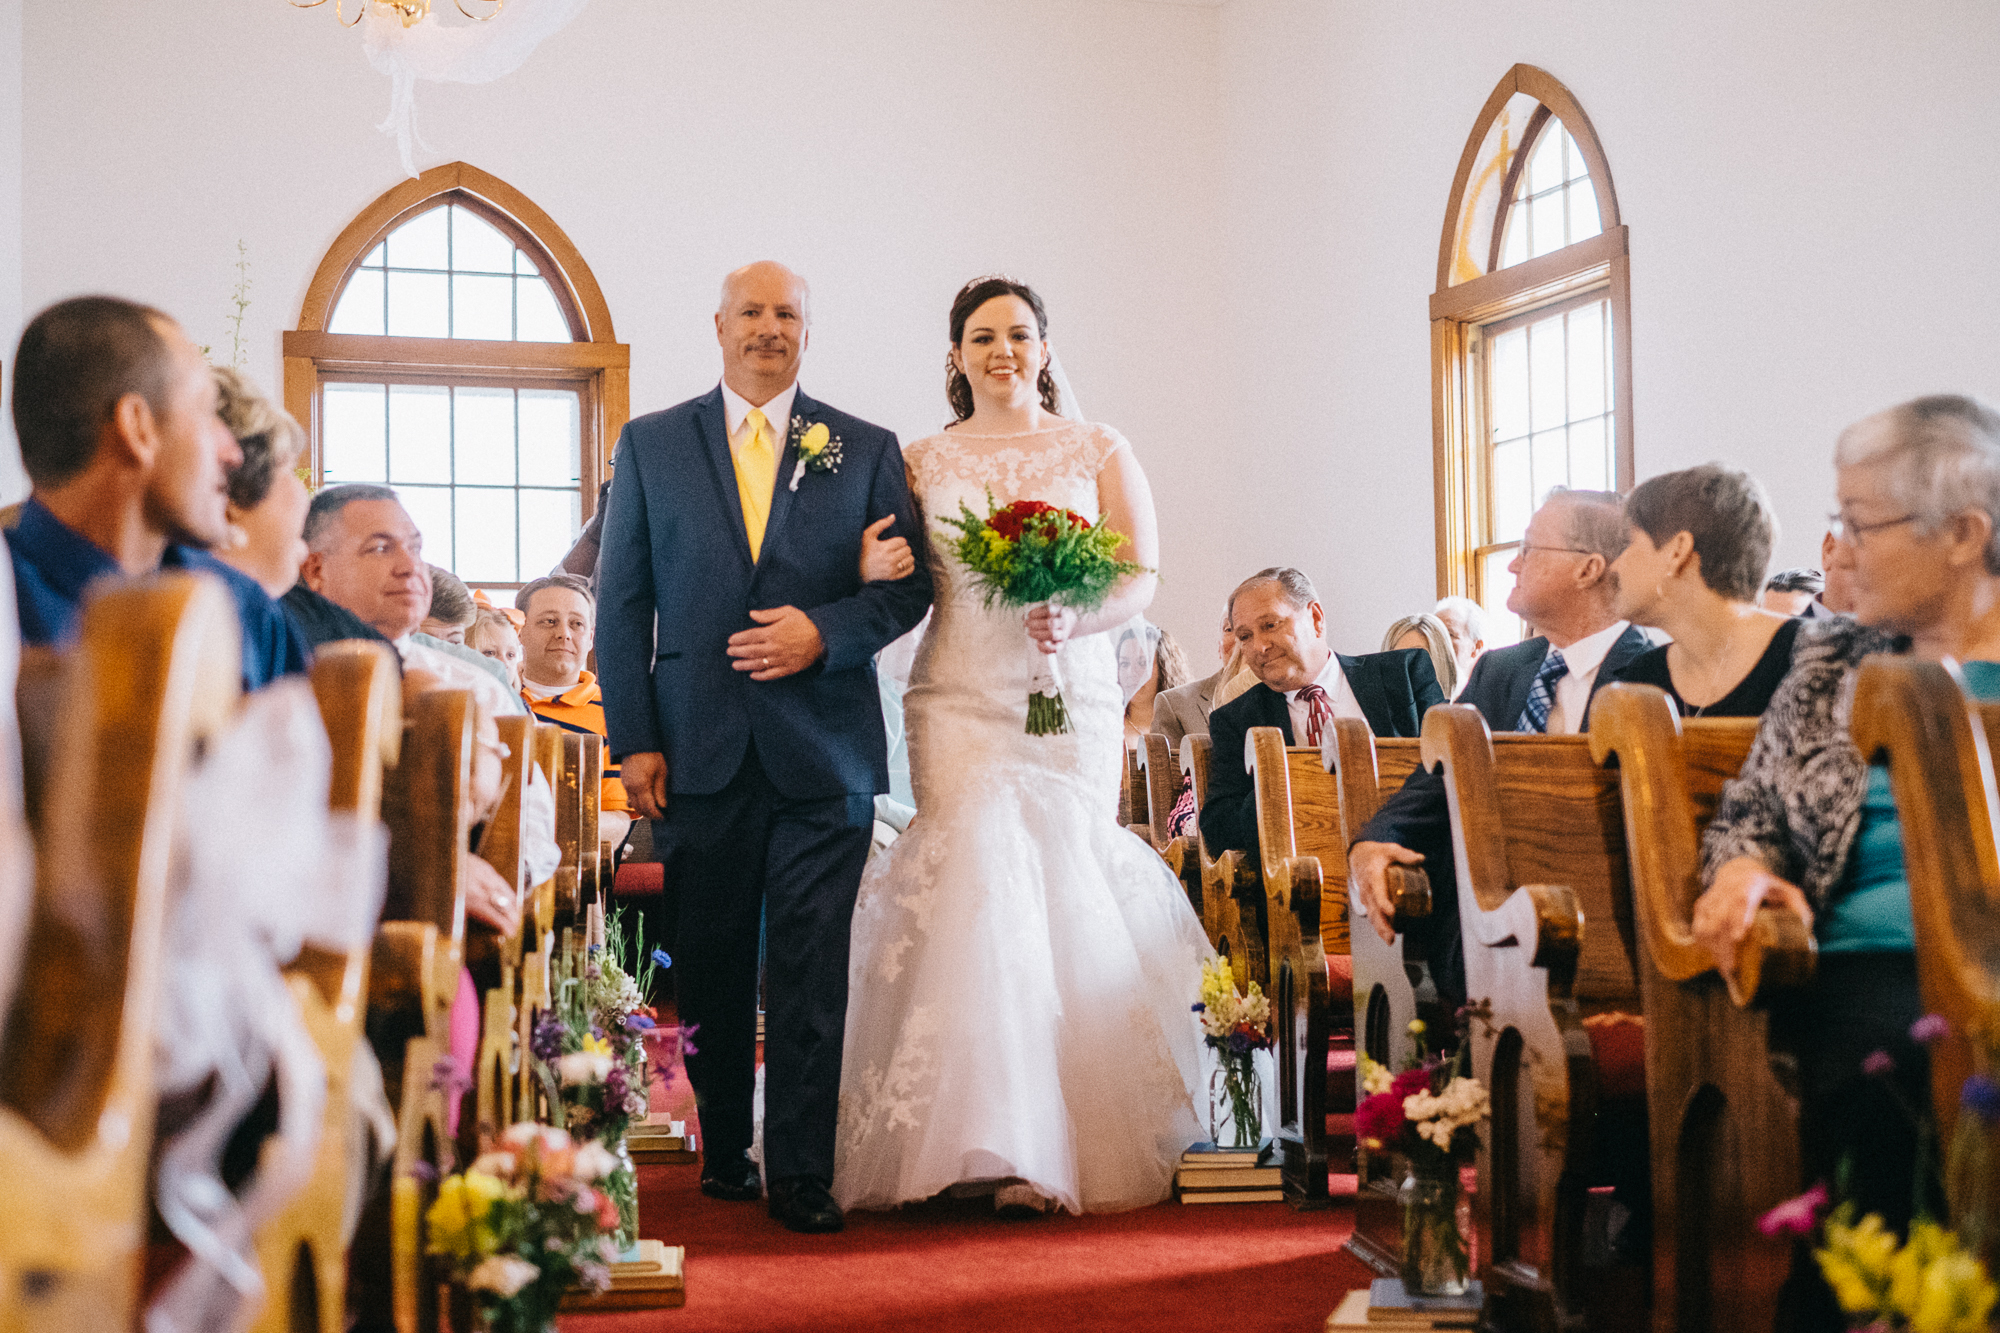 Emily-Shay-wedding-blog-13.jpg